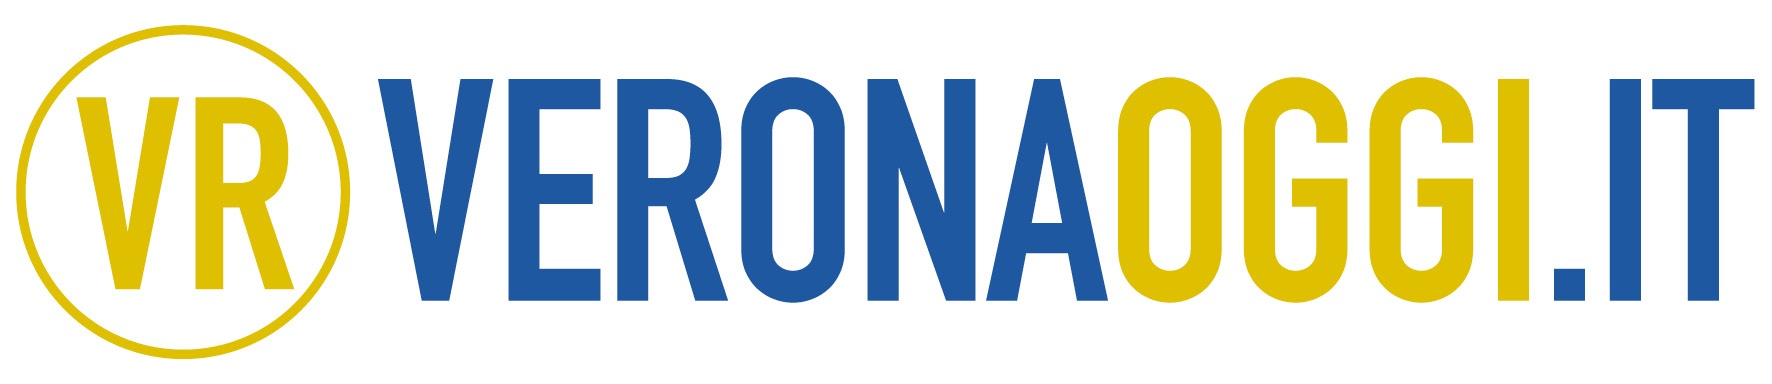 Verona Oggi - notizie da Verona